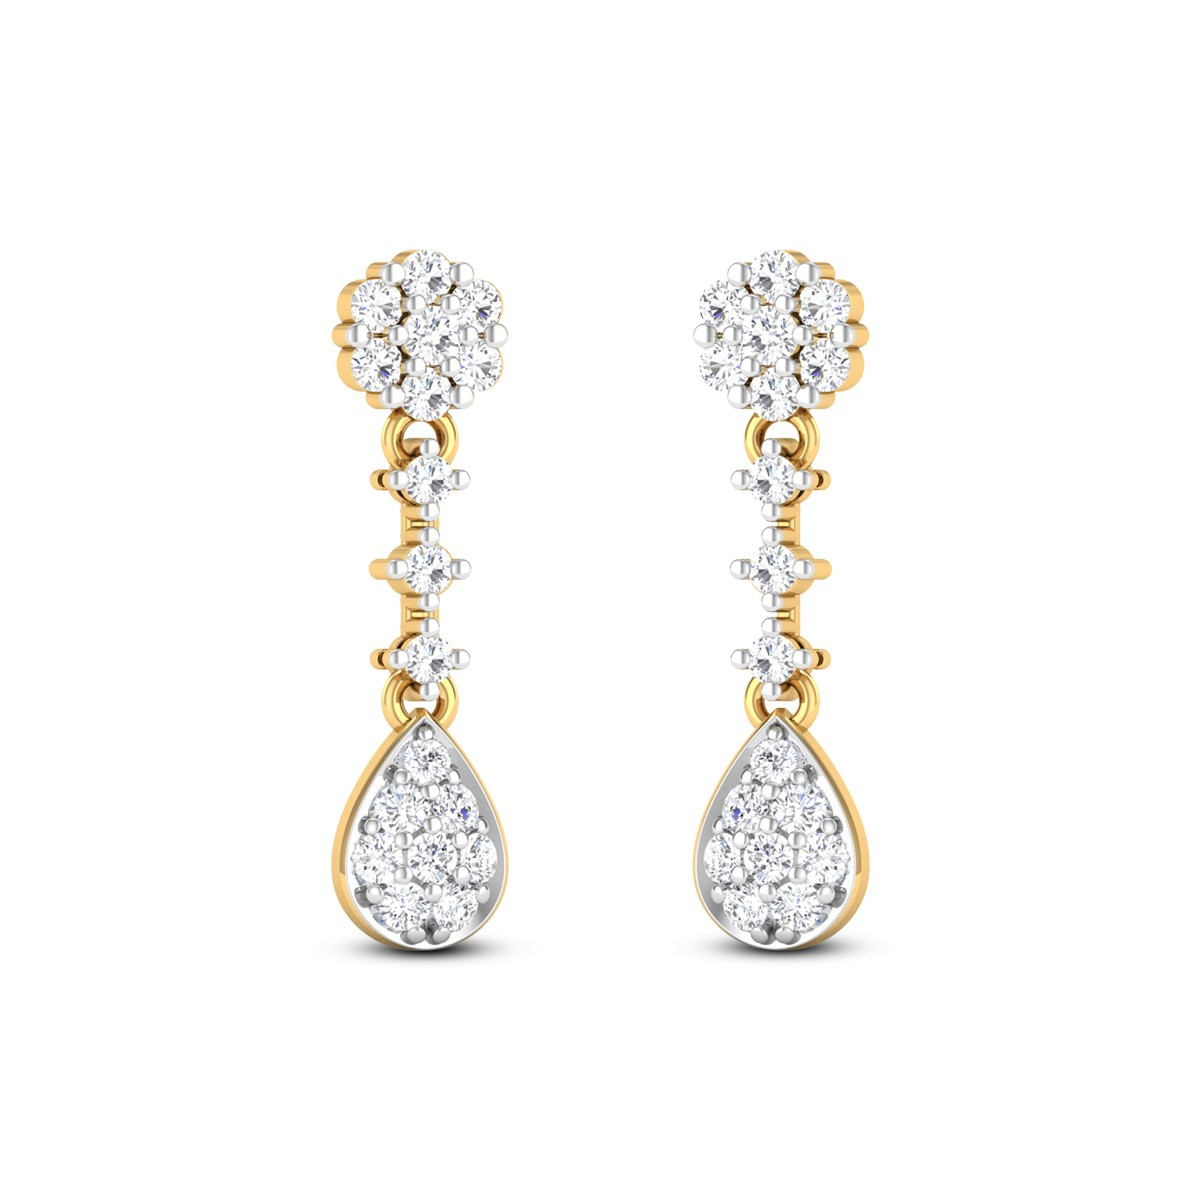 Enriquez Diamond Earrings